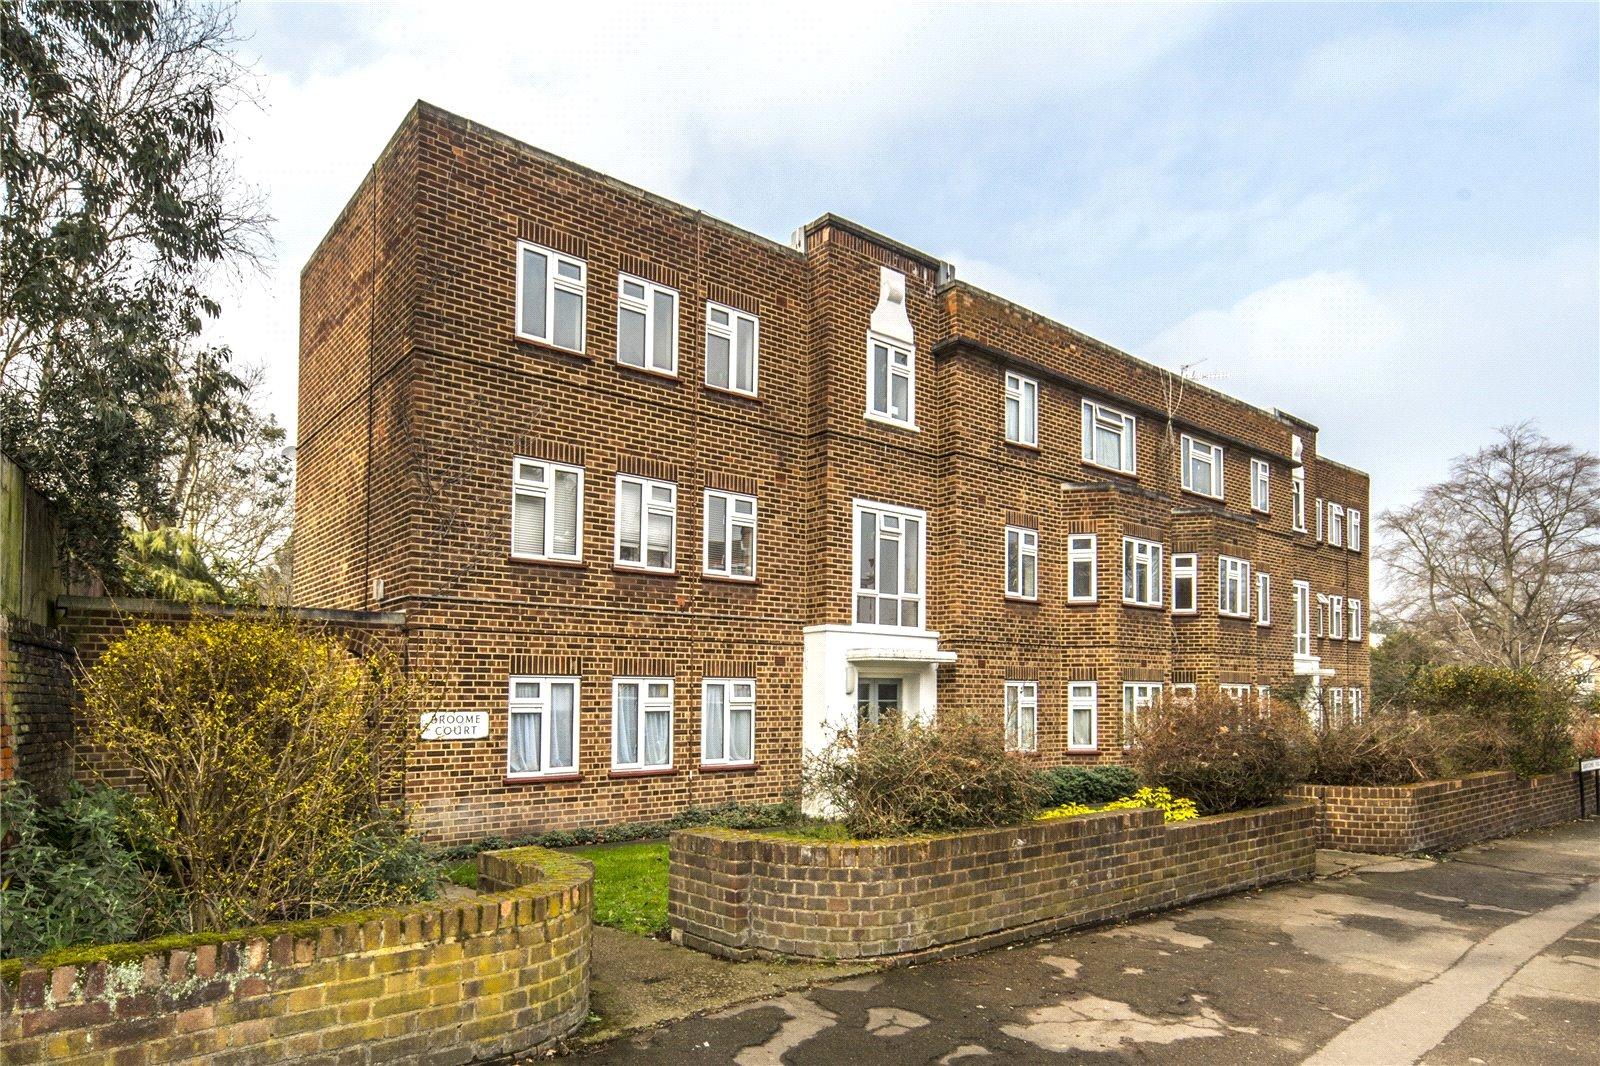 Broomfield Road, Kew, TW9 3QF - Antony Roberts